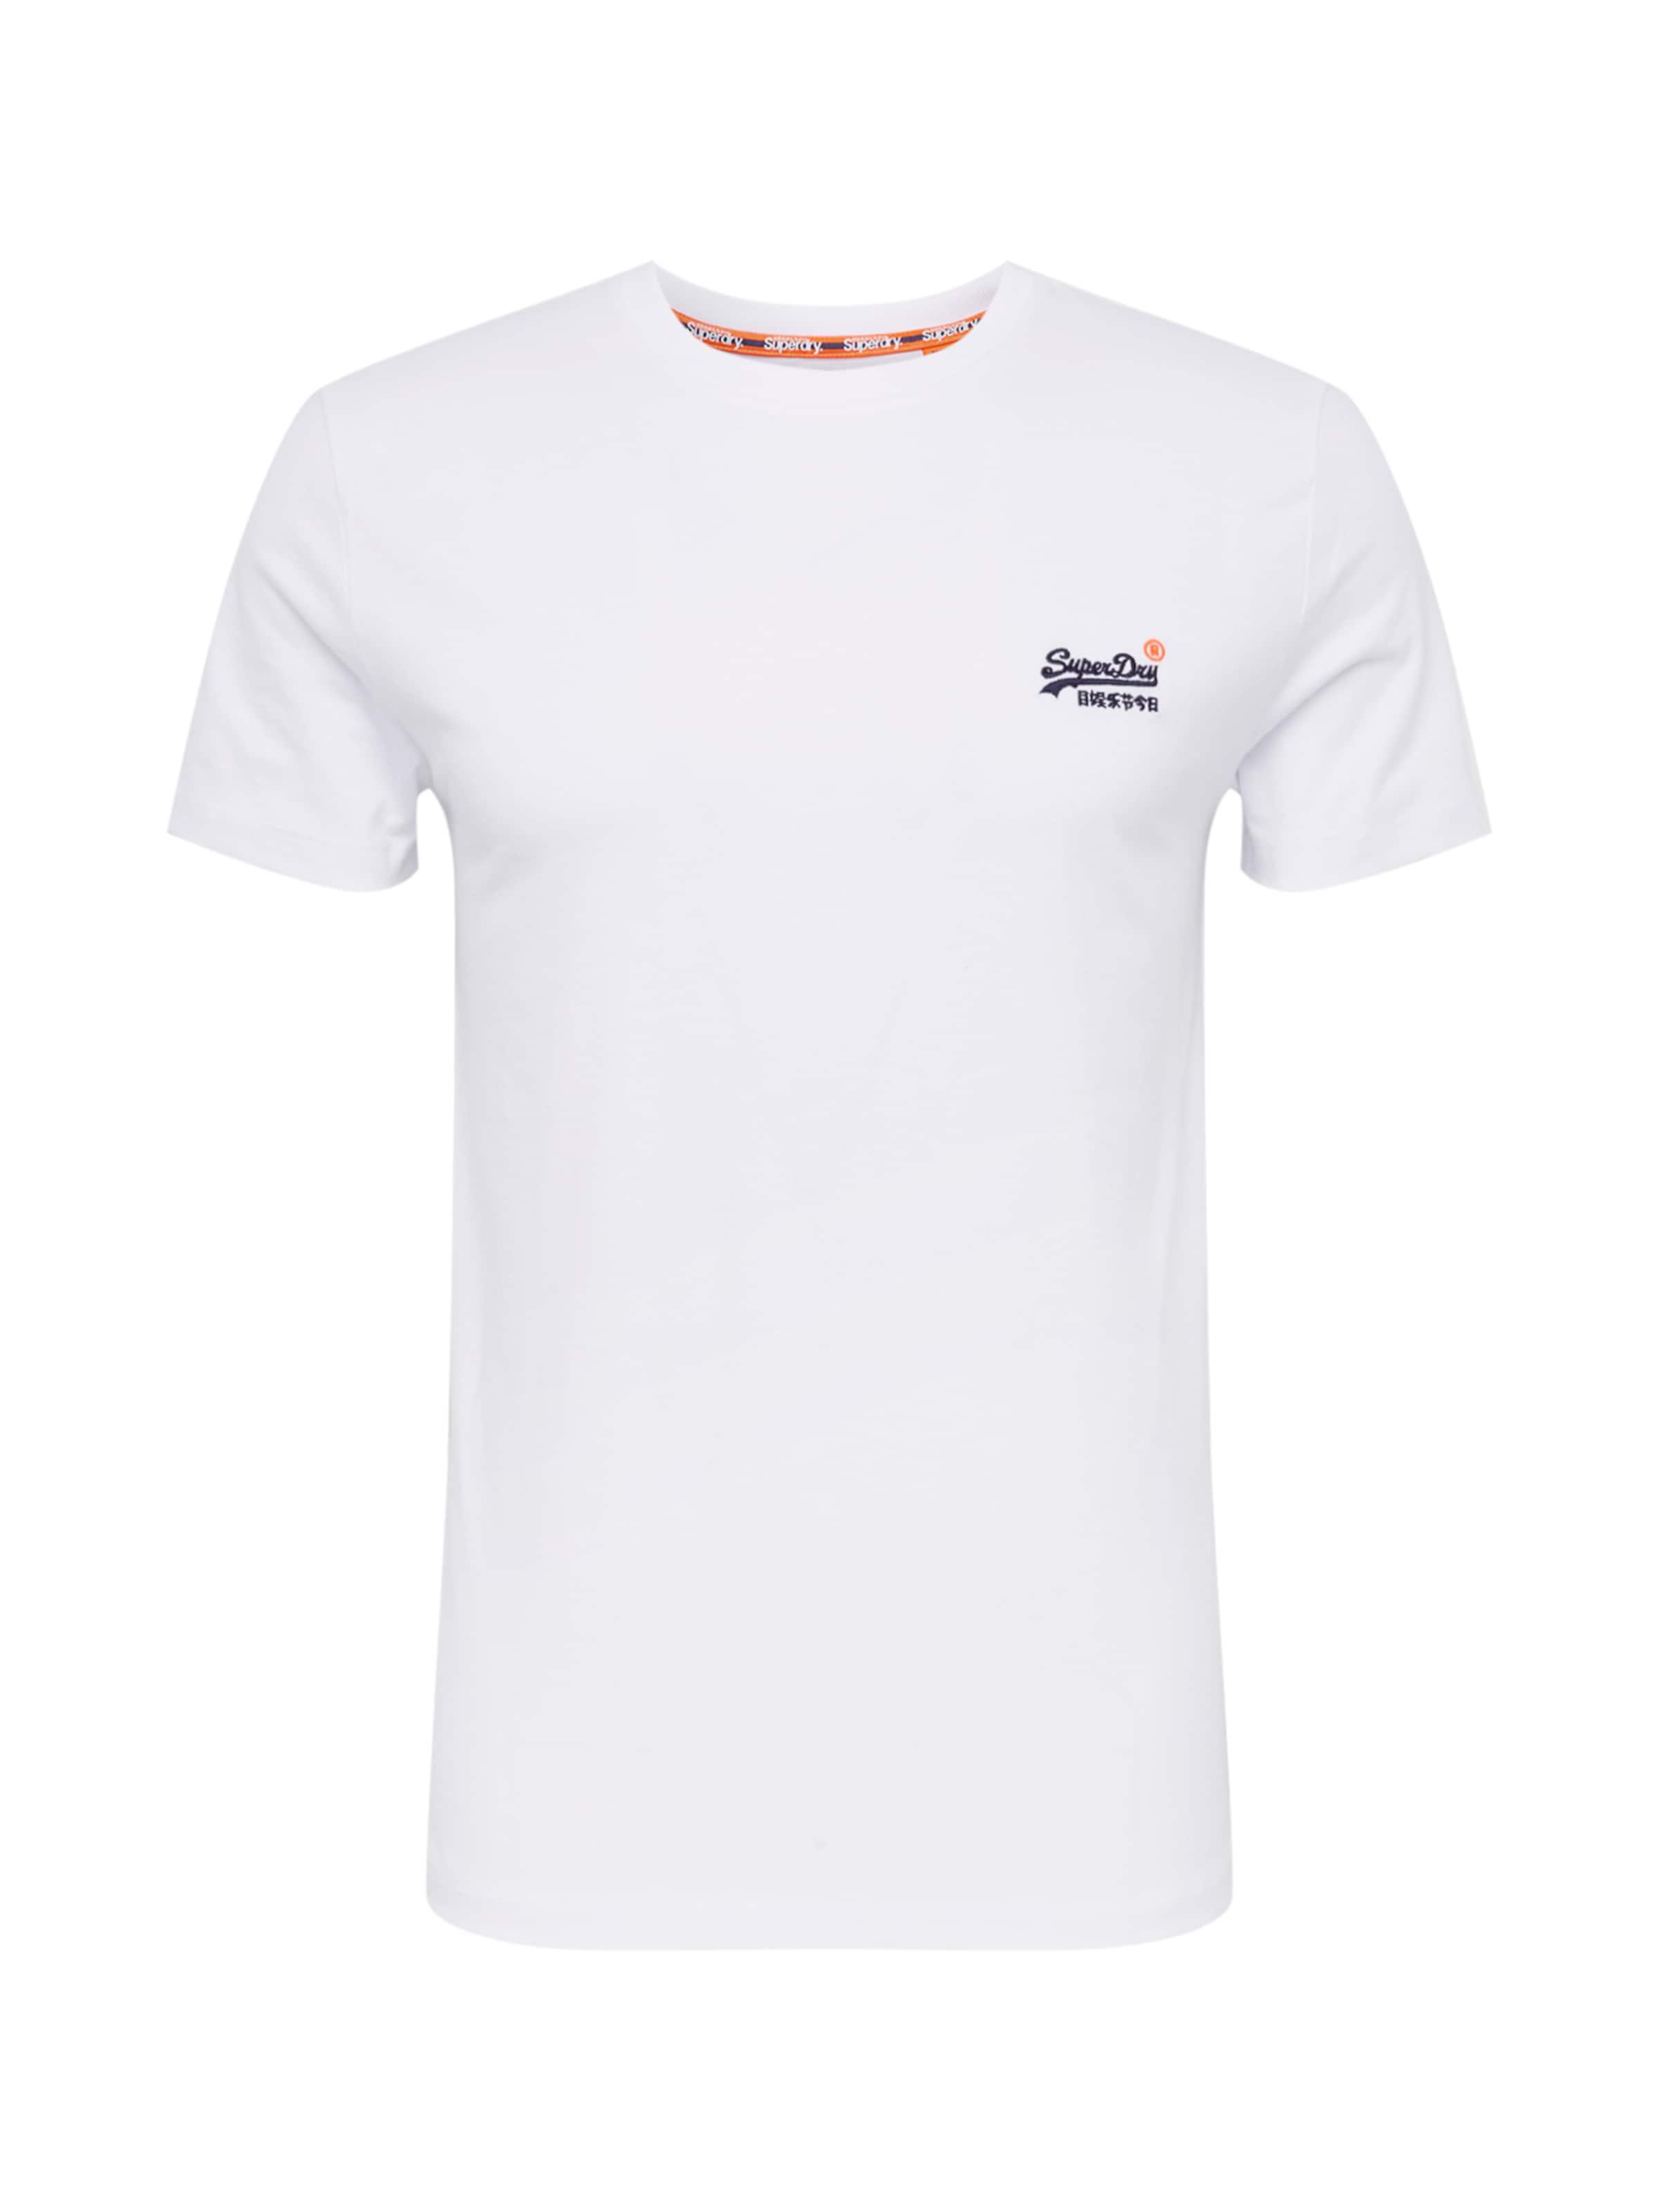 Vintage Tee' Label Shirt 'orange Weiß Superdry In Embroidery ZkOPiwTXu